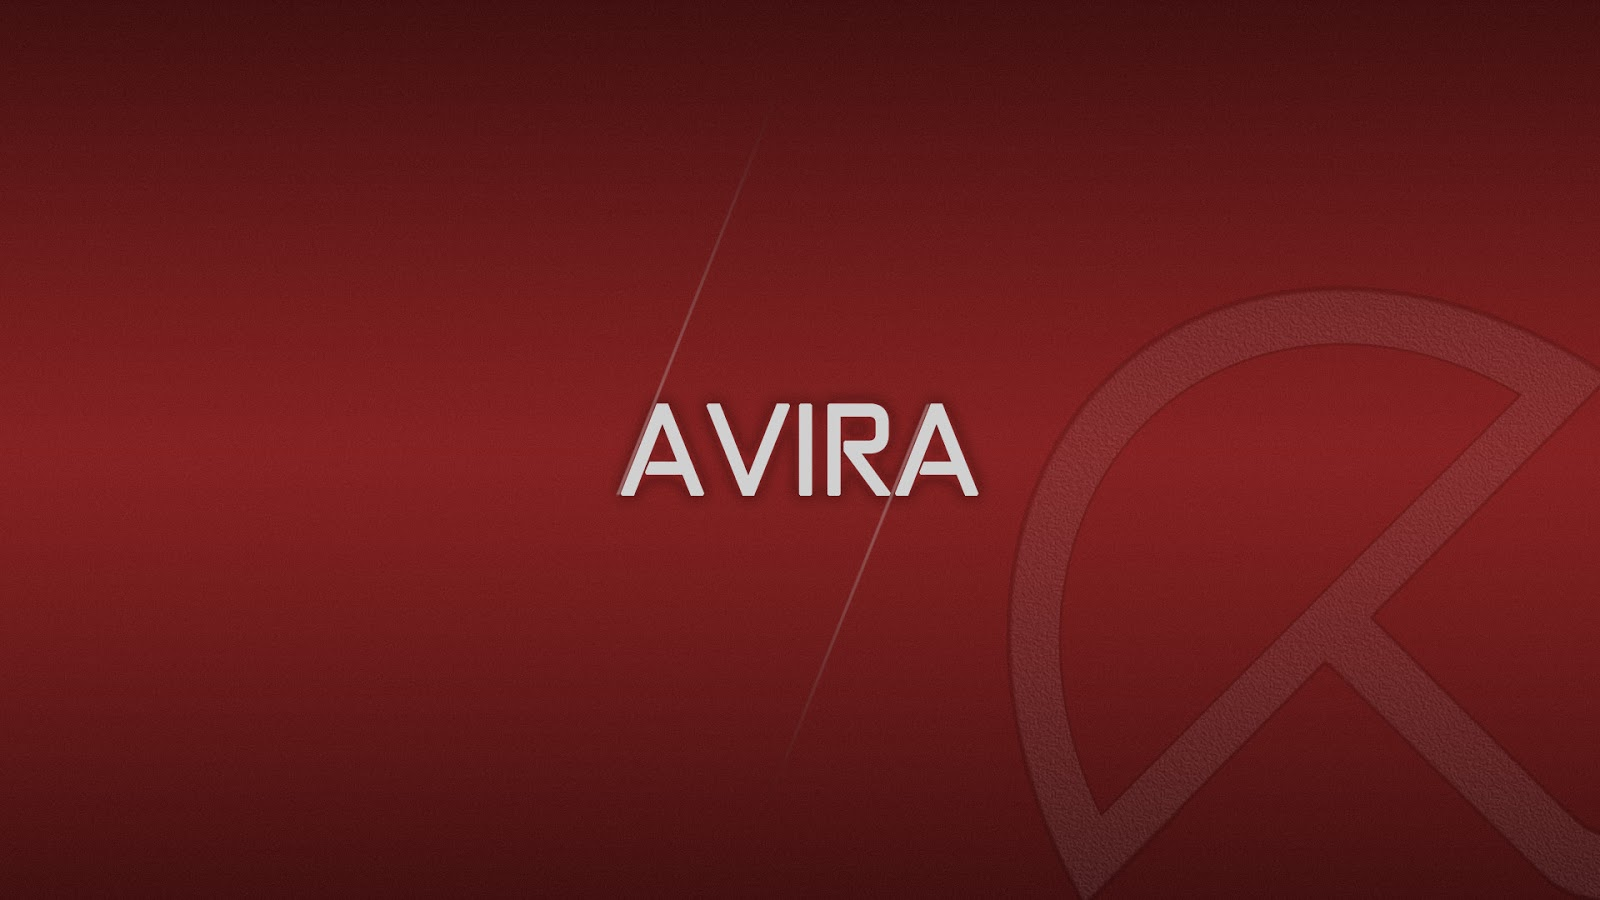 Avira%2Bby%2BMikeV - Avira PC Cleaner - 小紅傘公司推出的免費電腦掃毒軟體,免安裝超方便!